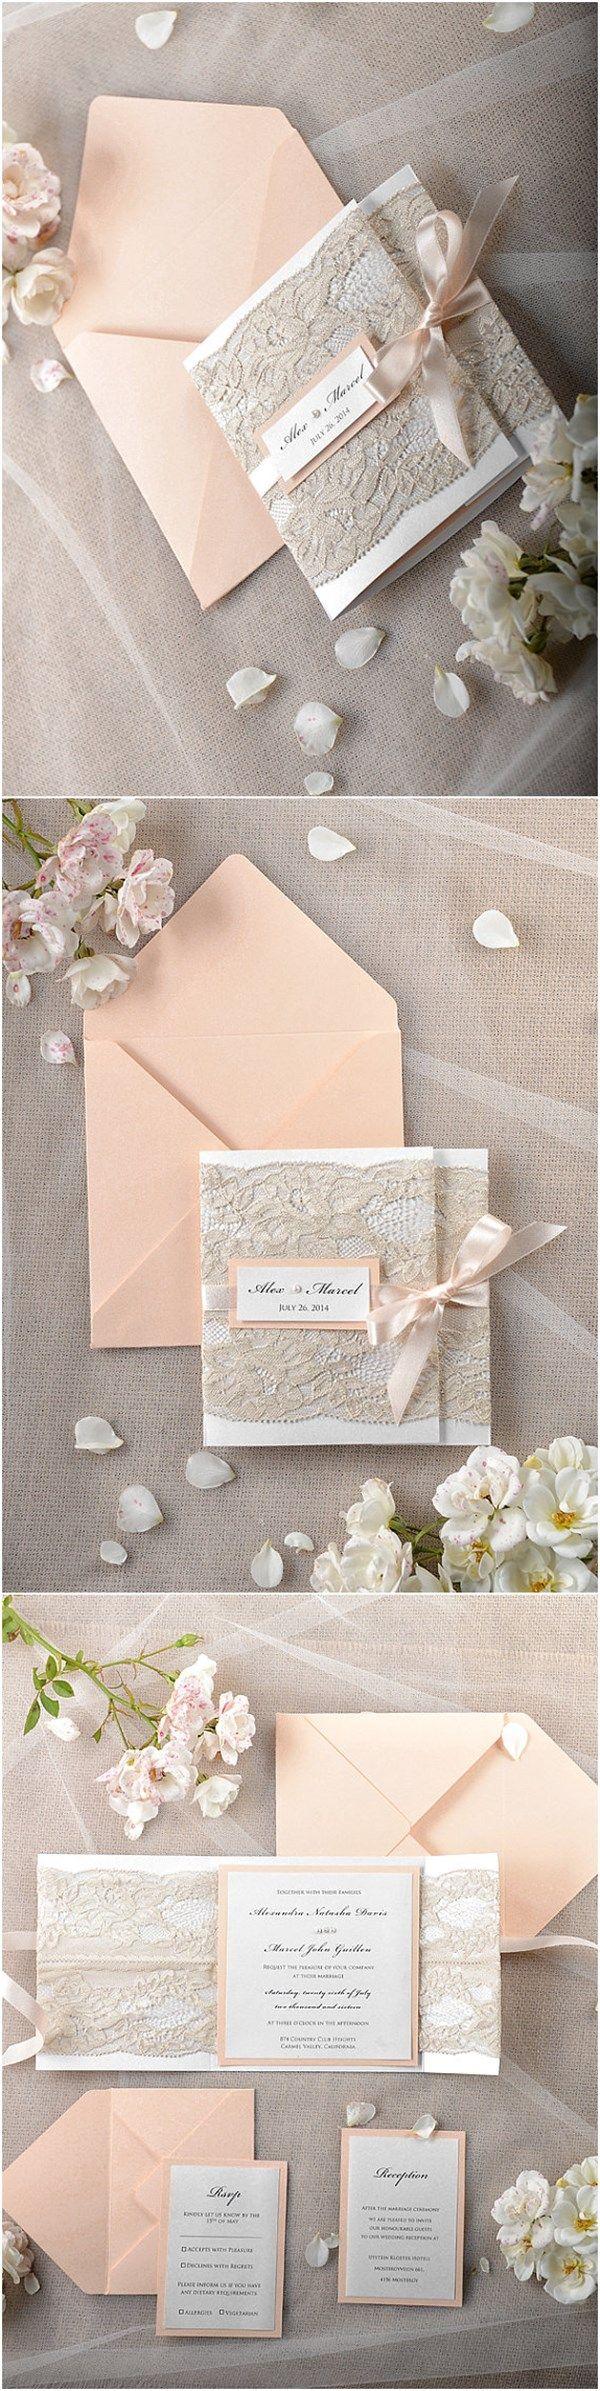 Peach Vintage Lace Coral Wedding Invitations Peach